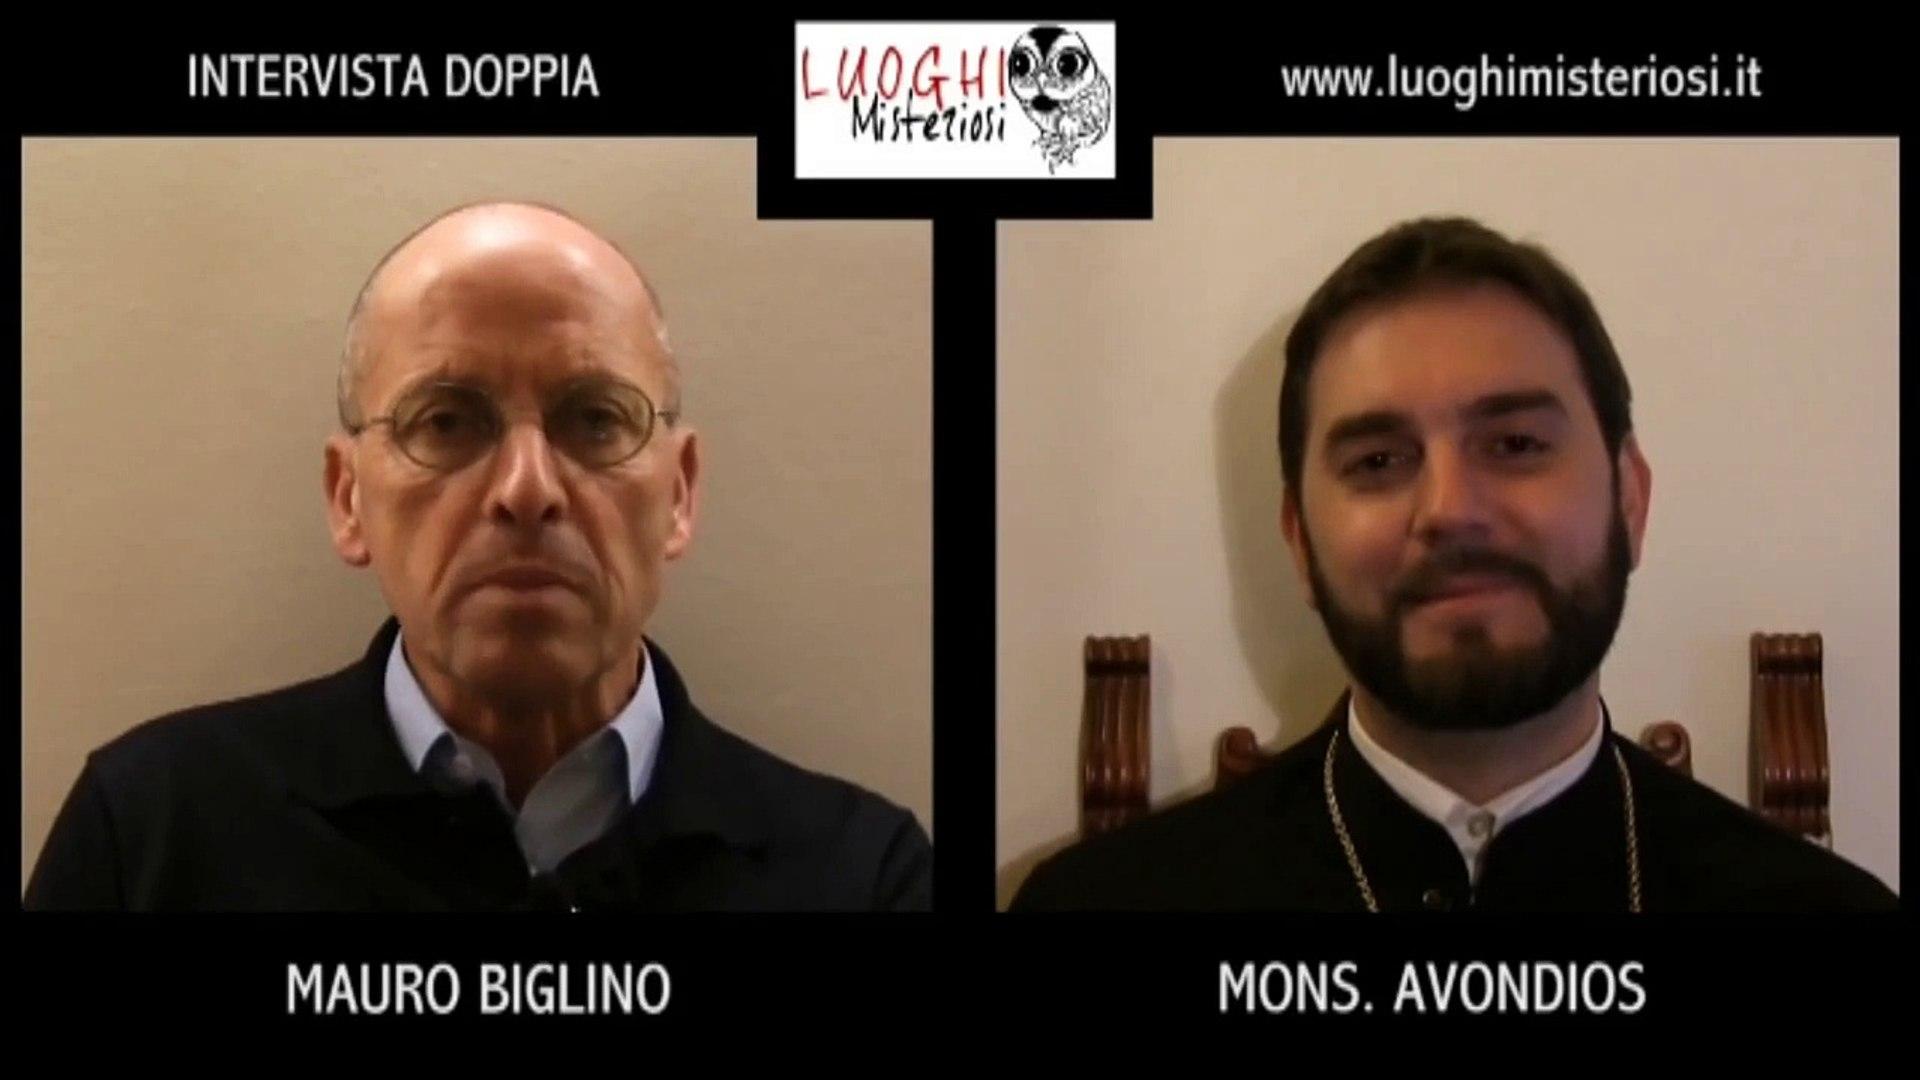 Intervista doppia Mauro Biglino - Monsignor Avondios